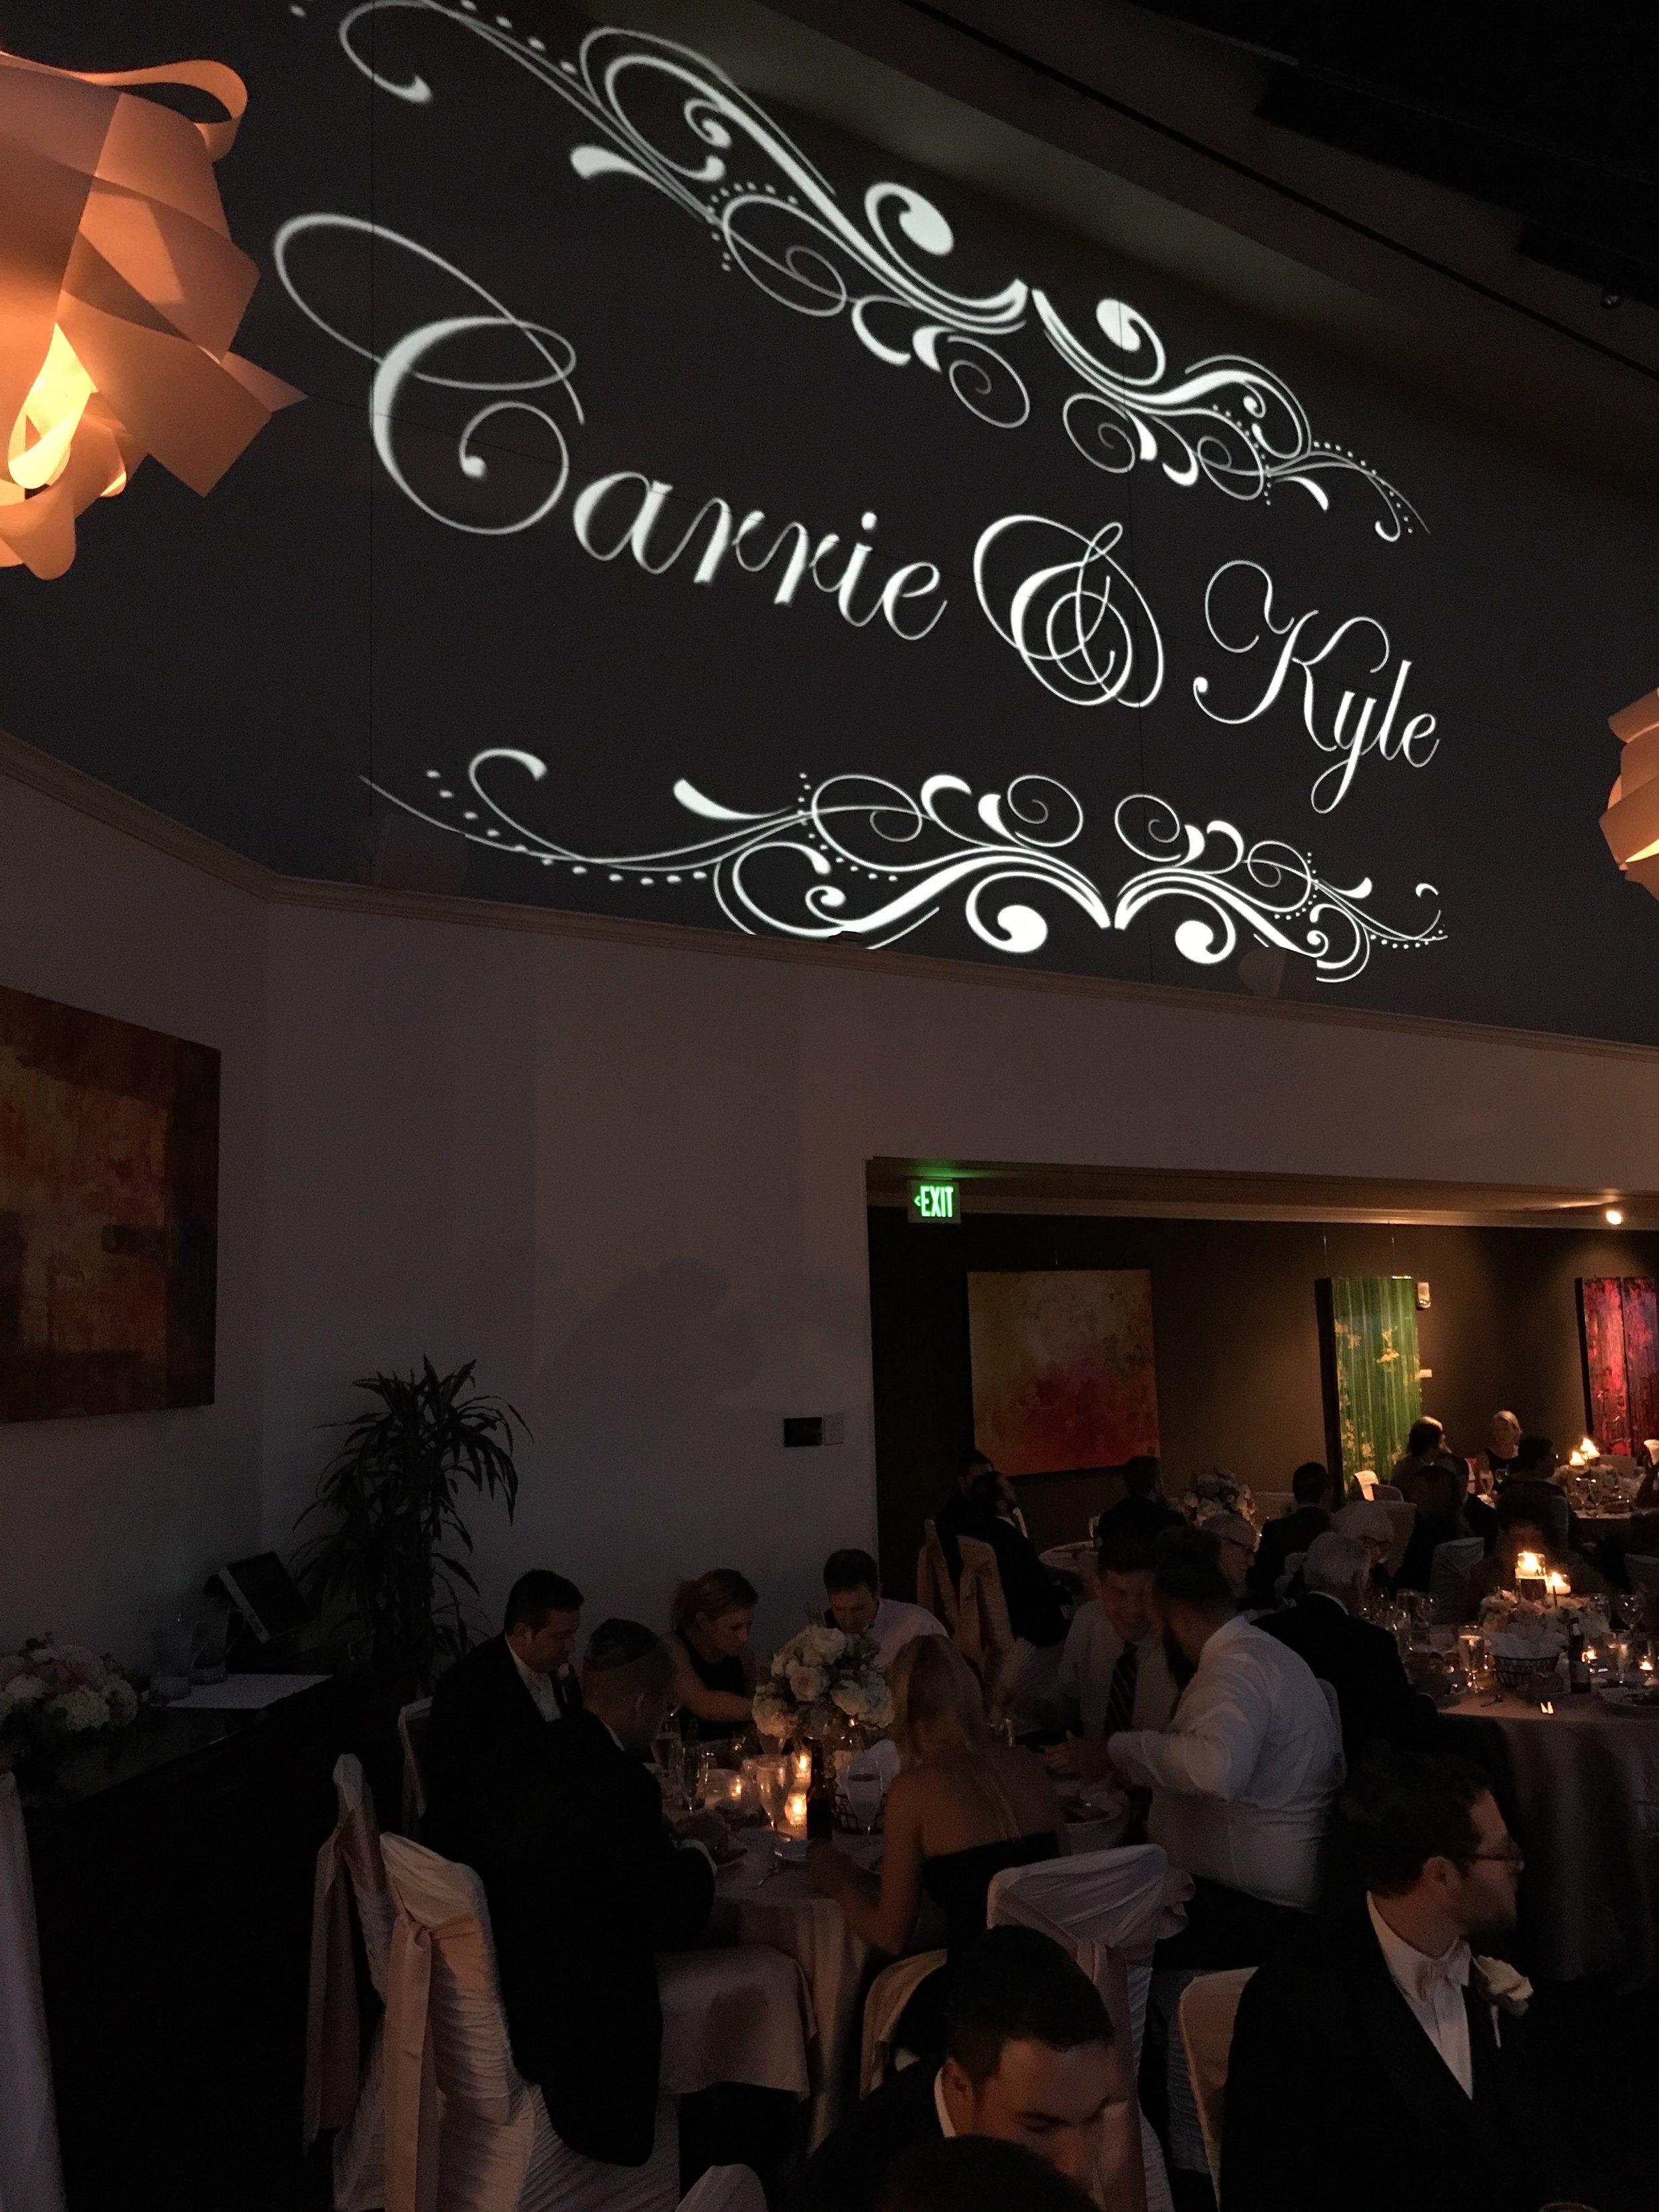 The Skyline Club's huge canvas for Carrie & Kyle's custom monogram by Jim Cerone